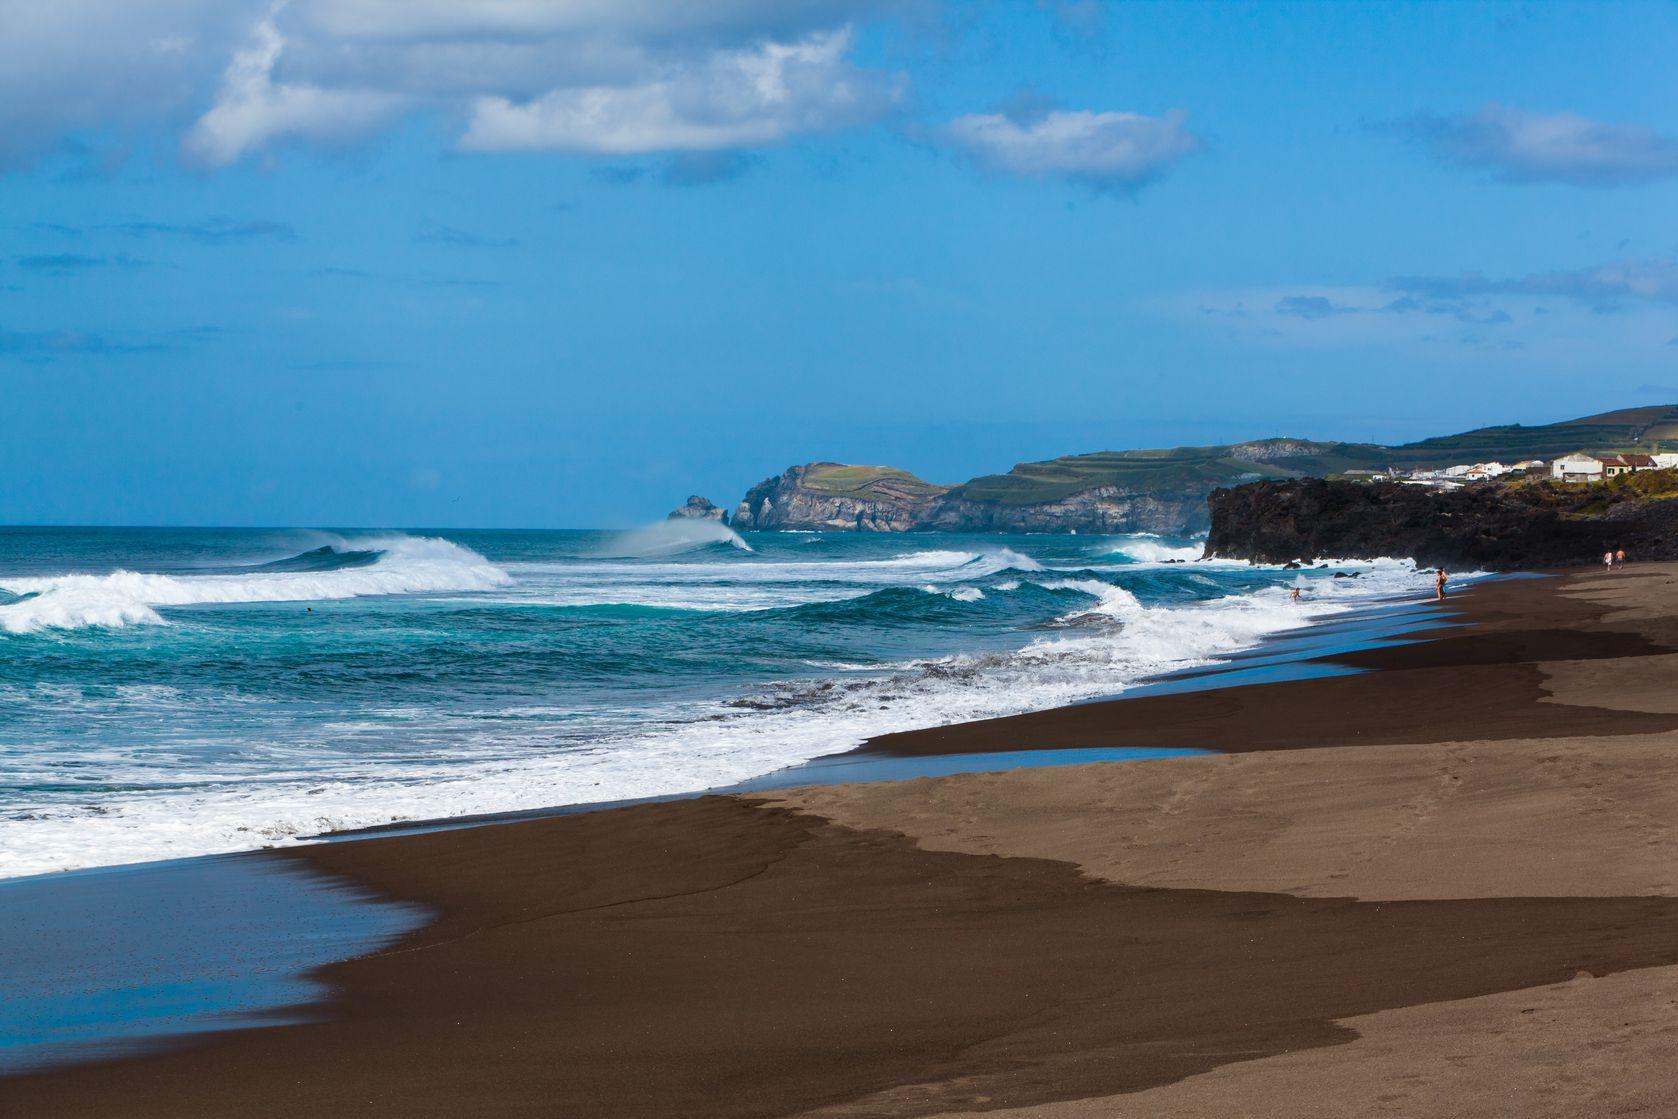 galapagos_bigstock-Beautiful-panorama-of-Galapago-41598244.jpg